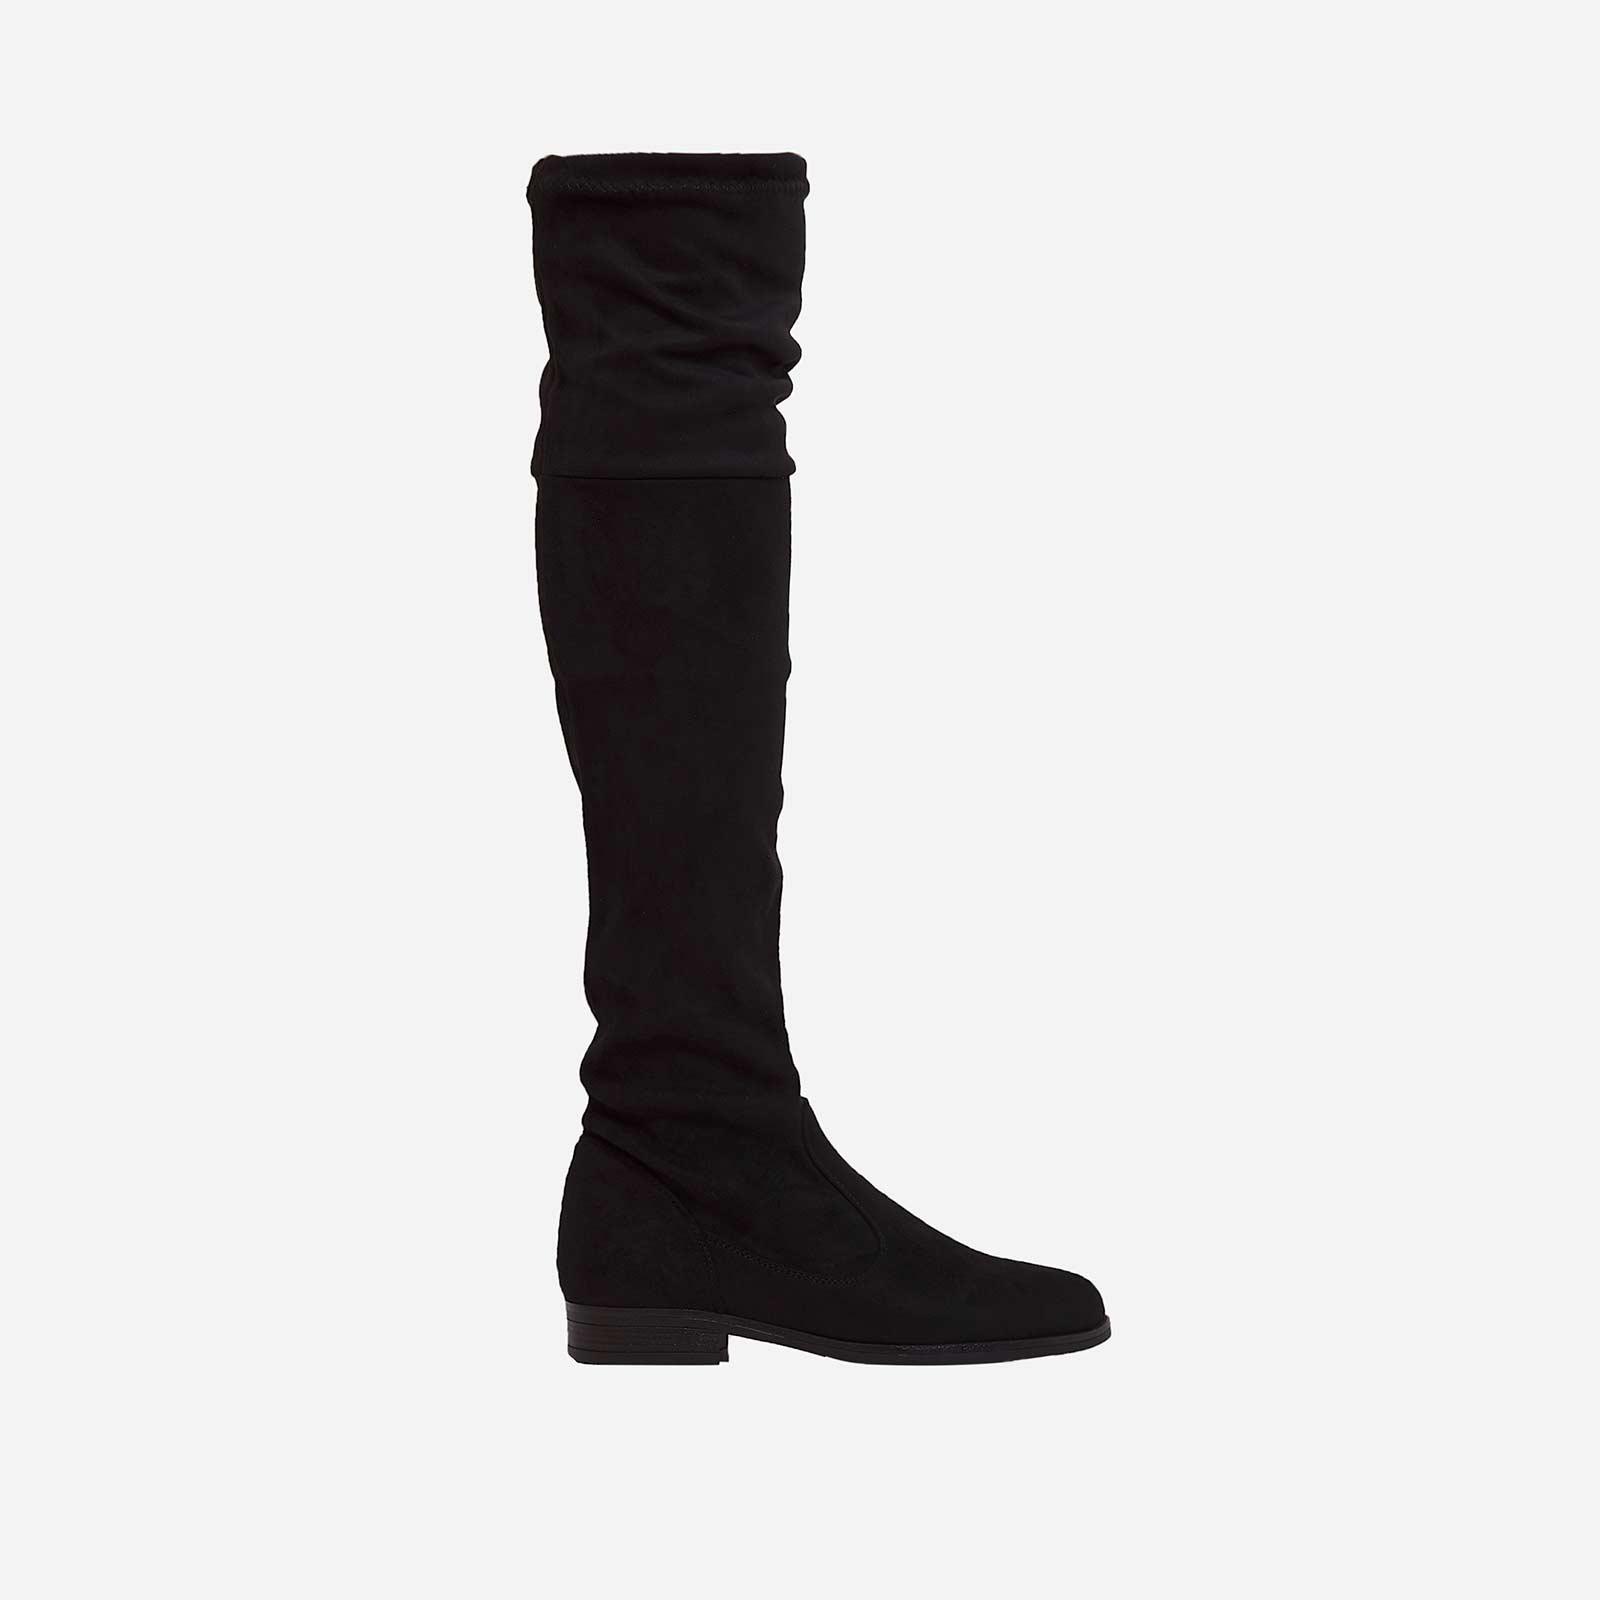 Melanie Long Boot In Black Faux Suede